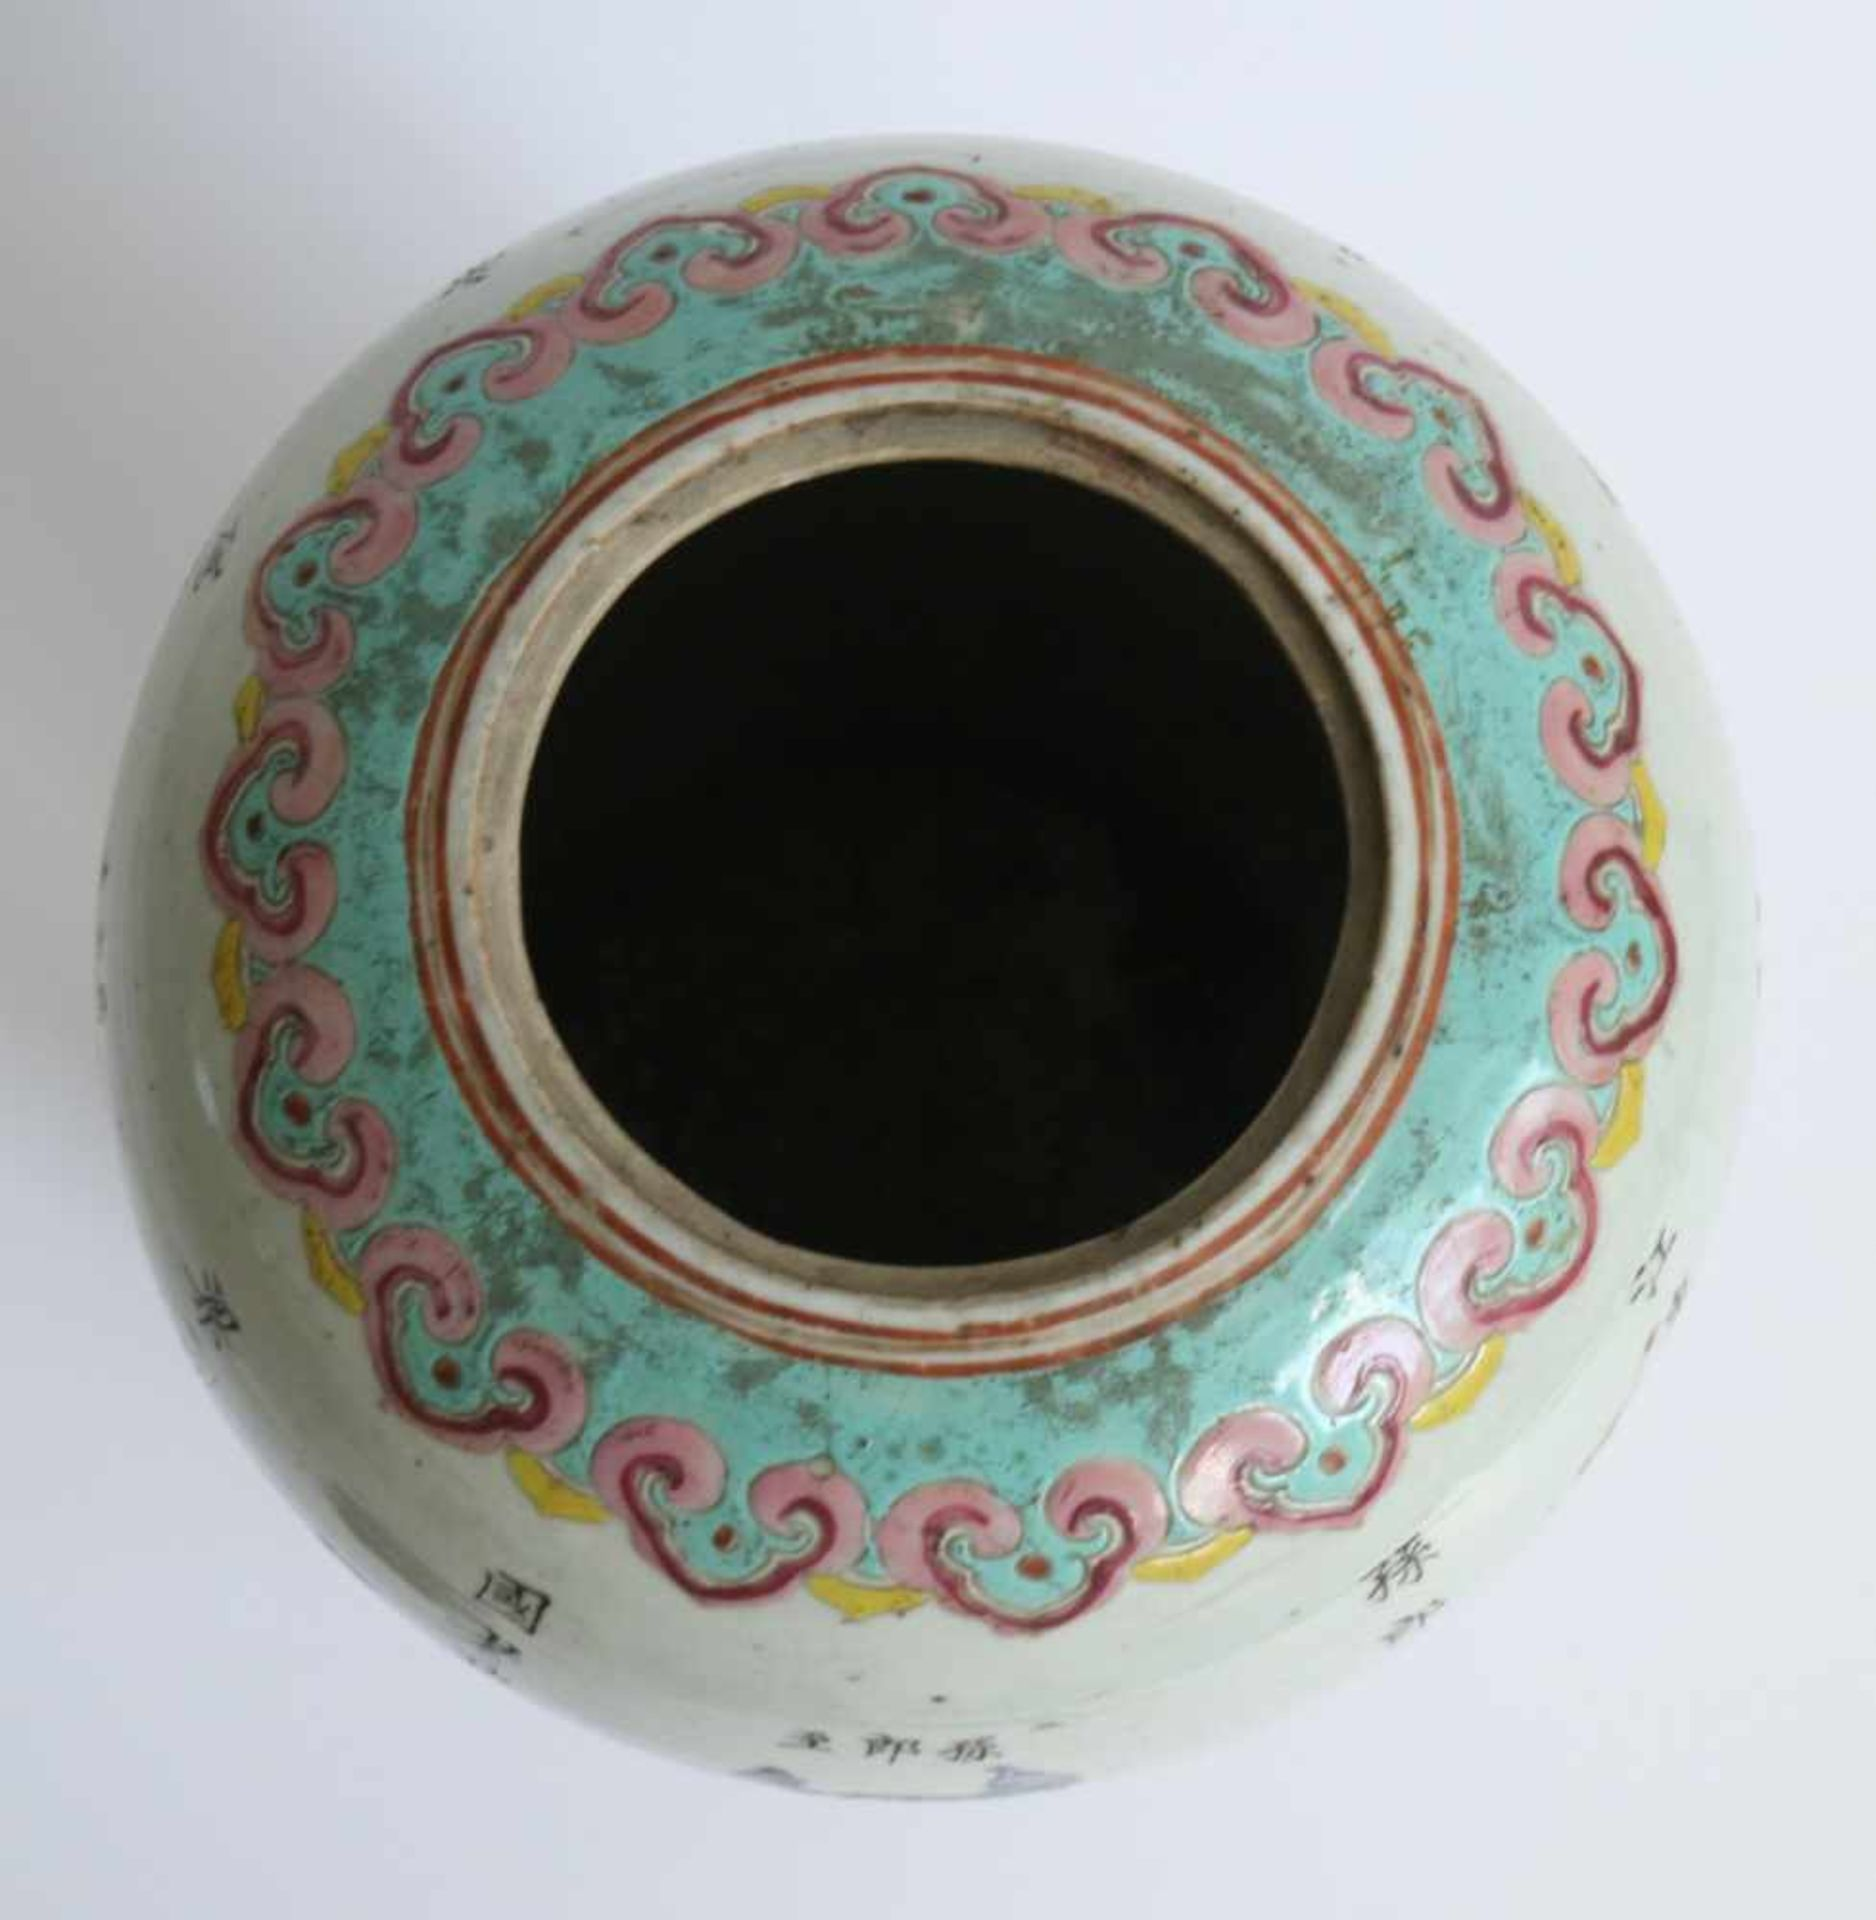 Los 411 - Chinese Ginger Jar 19th century decor wushuangpu, H 29 cm figures Sun Ce and Empress Wu Zetian